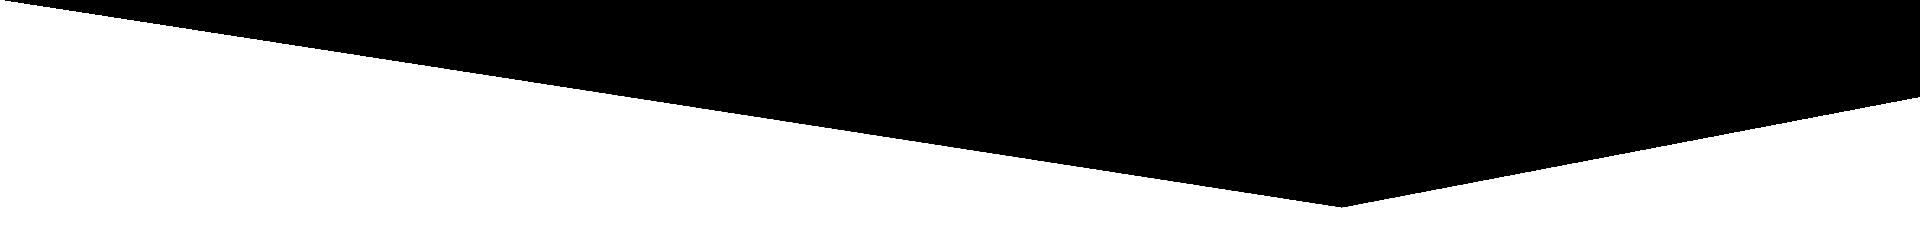 separador-banner.png